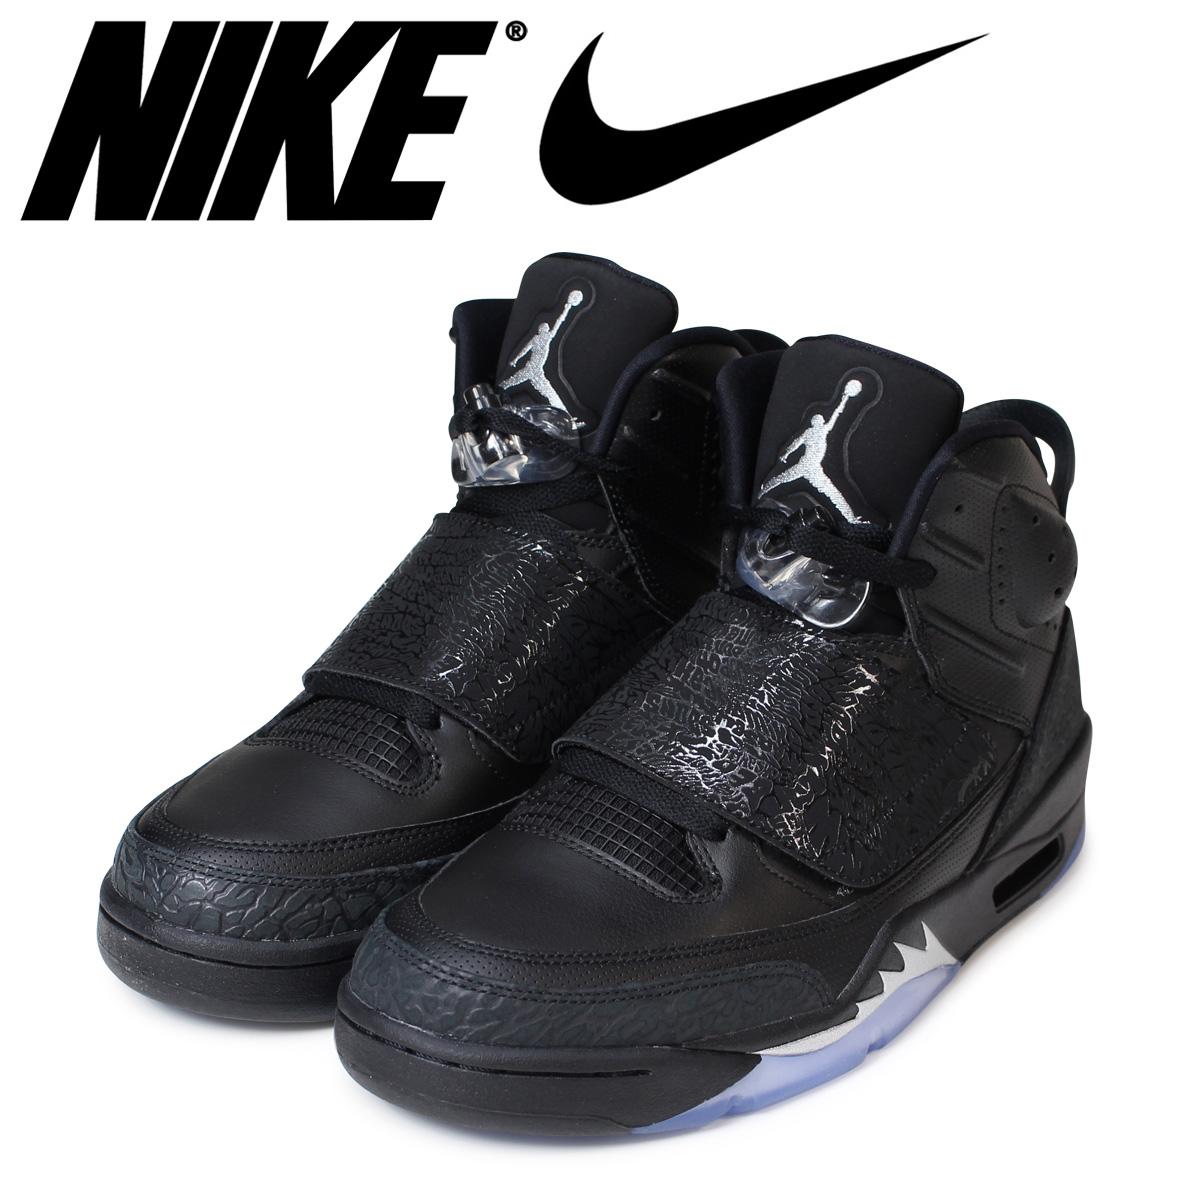 1c473ebdc3a944 ALLSPORTS  Nike NIKE Air Jordan men sneakers THE JORDAN SON 512